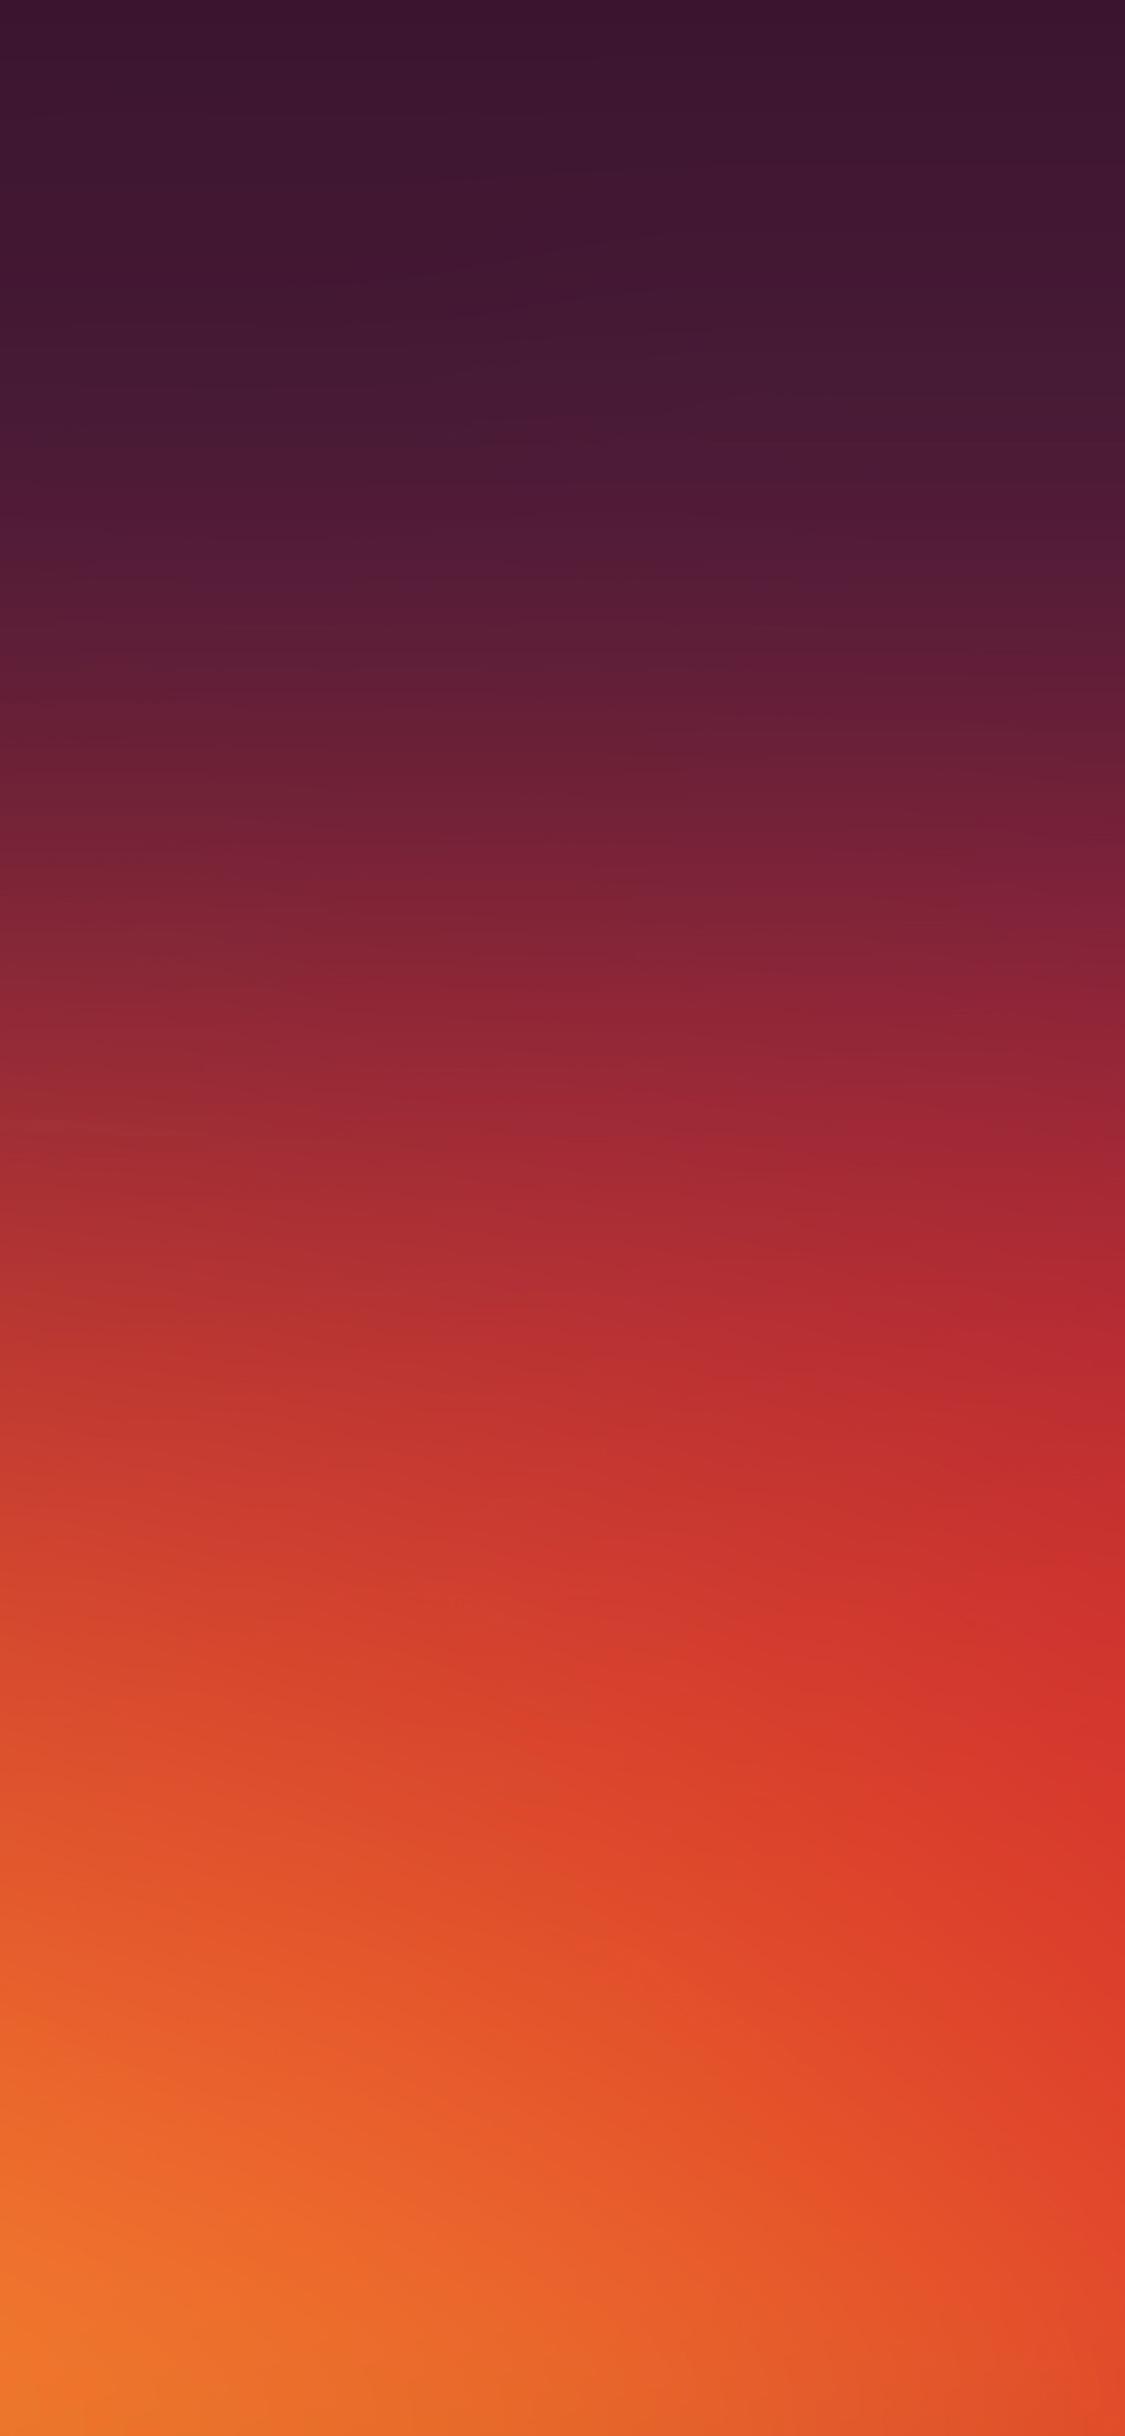 iPhoneXpapers.com-Apple-iPhone-wallpaper-se06-lava-life-red-hot-gradation-blur